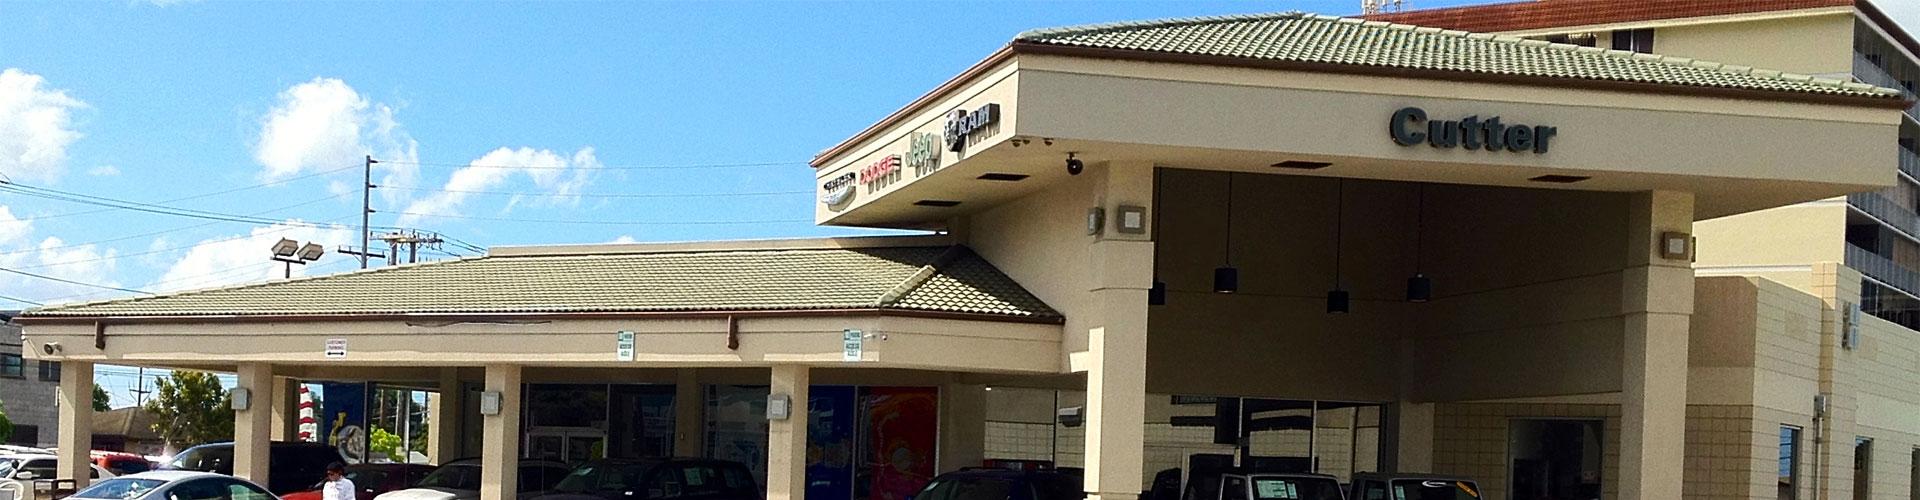 Cutter CDJR Dealership in Pearl City HI